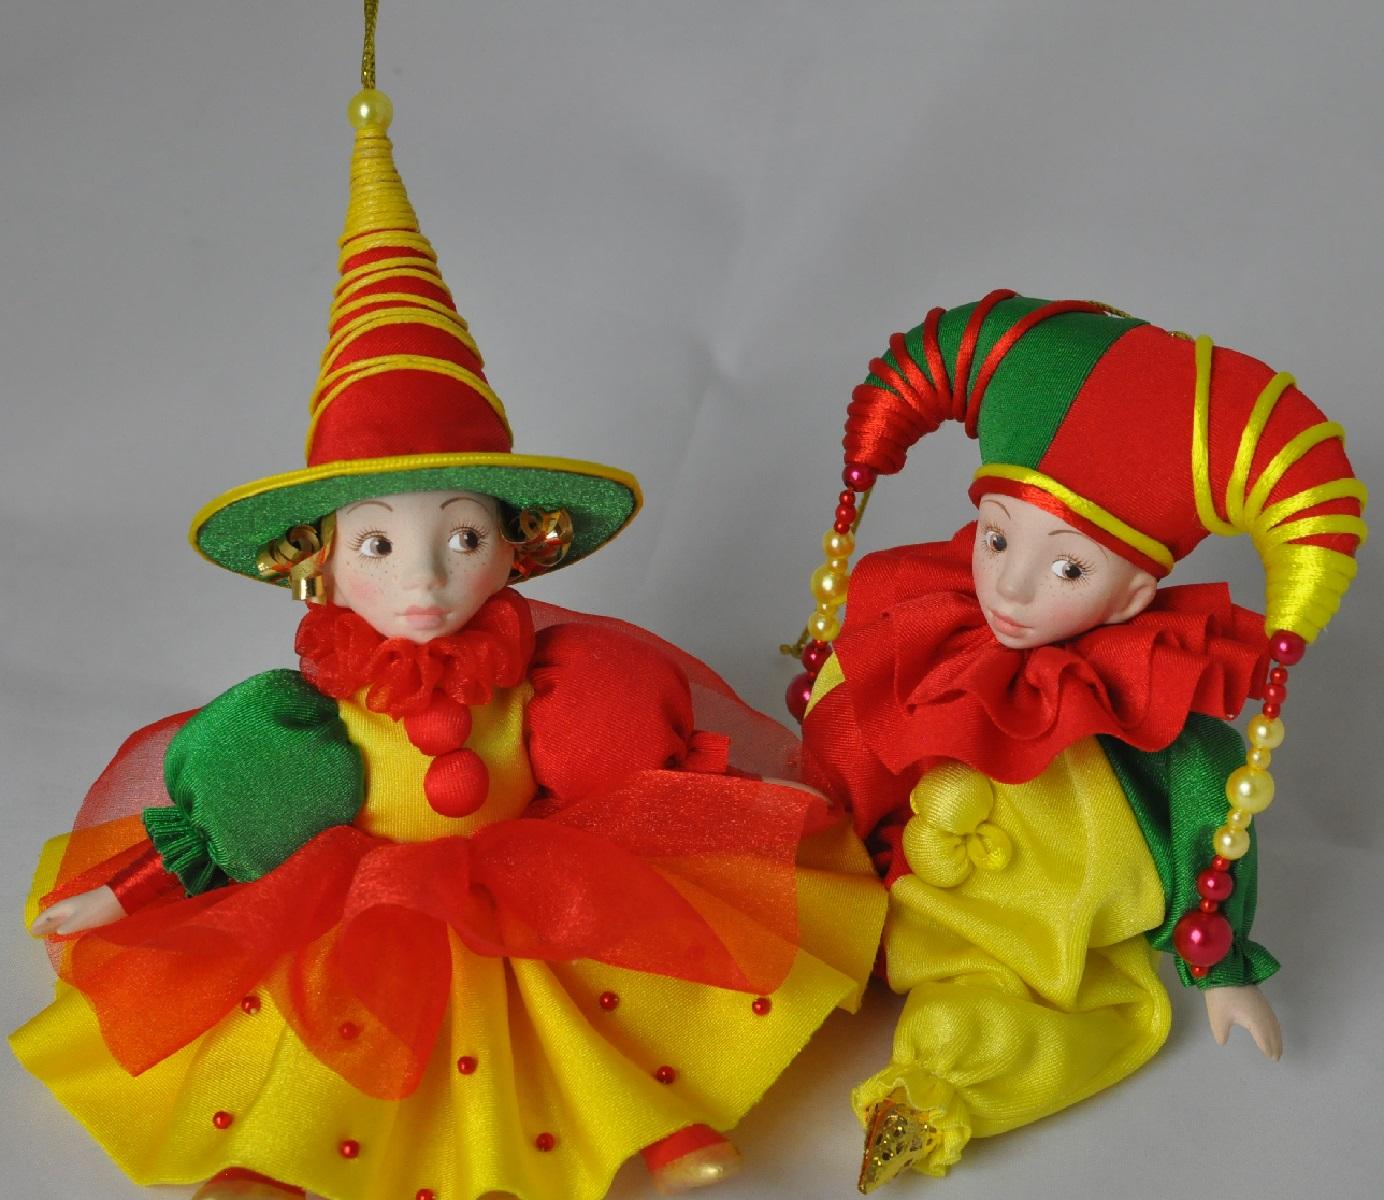 Картинки про монстер хай с домиками куклы сделал фотографии